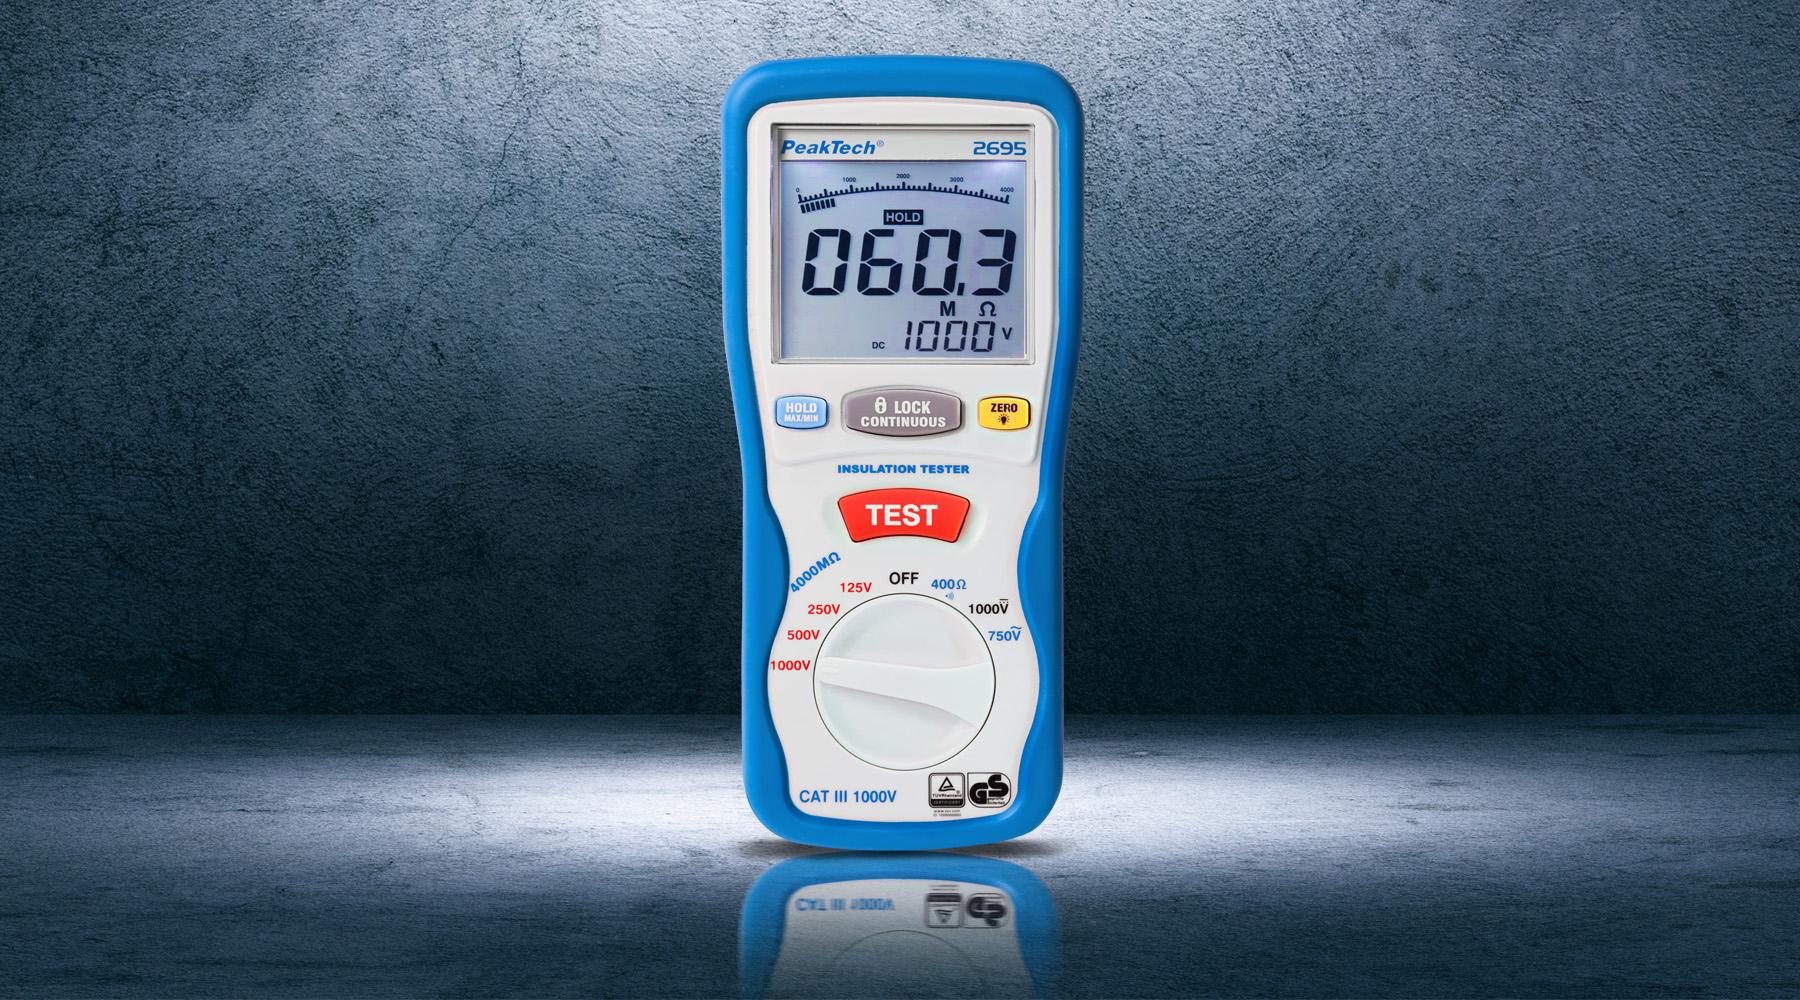 Insulation measuring device according to DIN EN 61557-2 (VDE 0413-2)